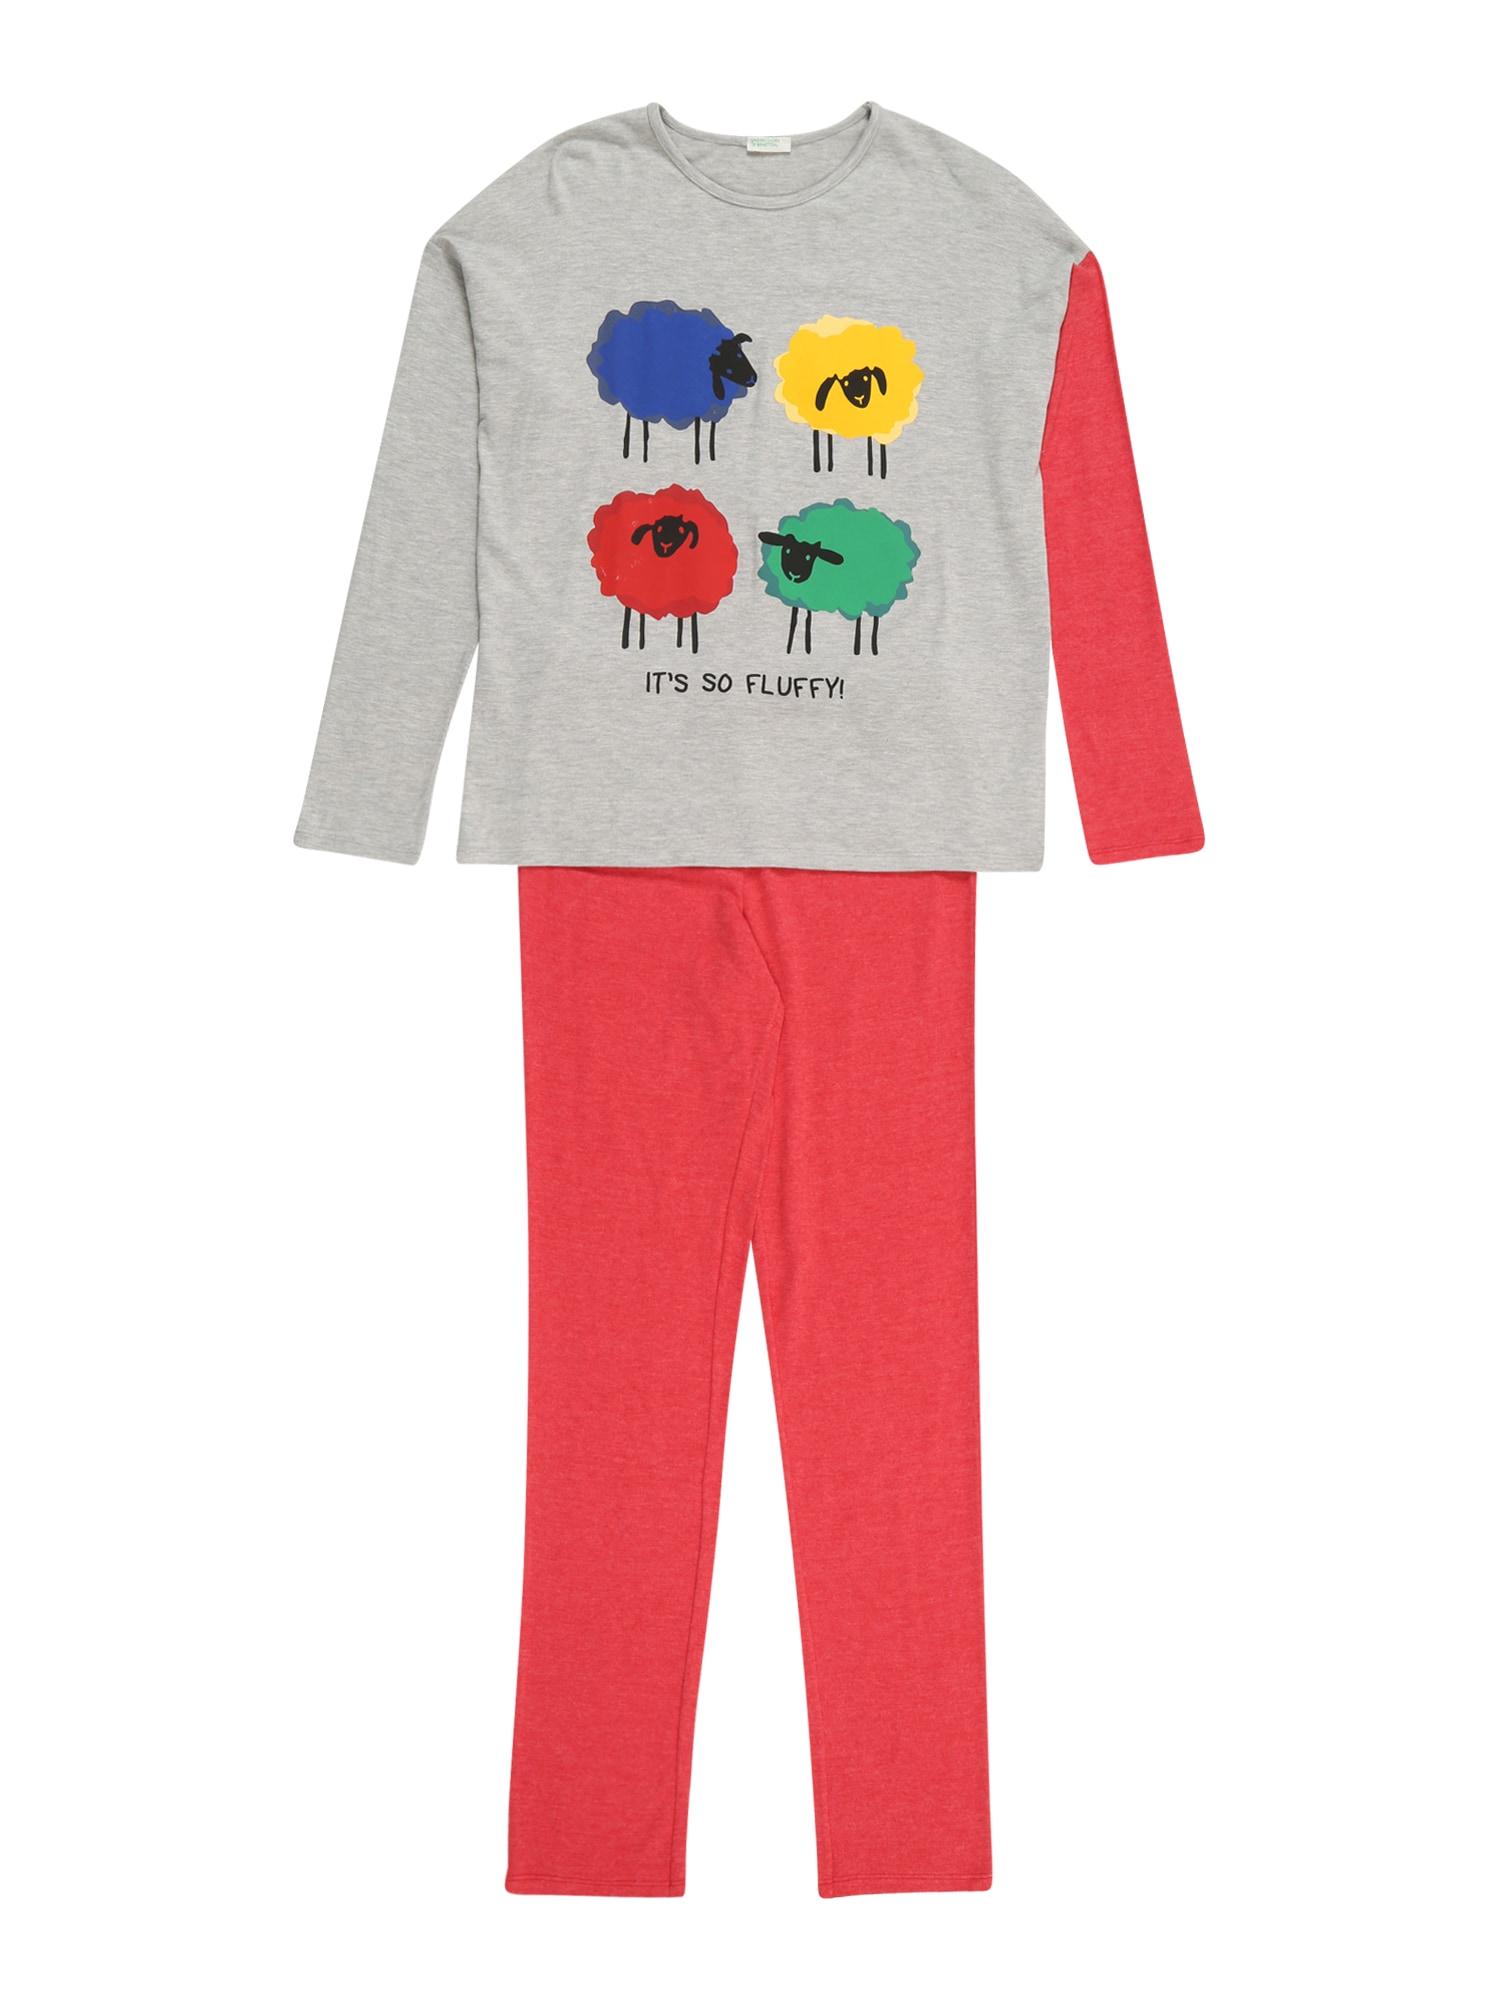 UNITED COLORS OF BENETTON Miego kostiumas pilka / melionų spalva / mėlyna / geltona / mišrios spalvos